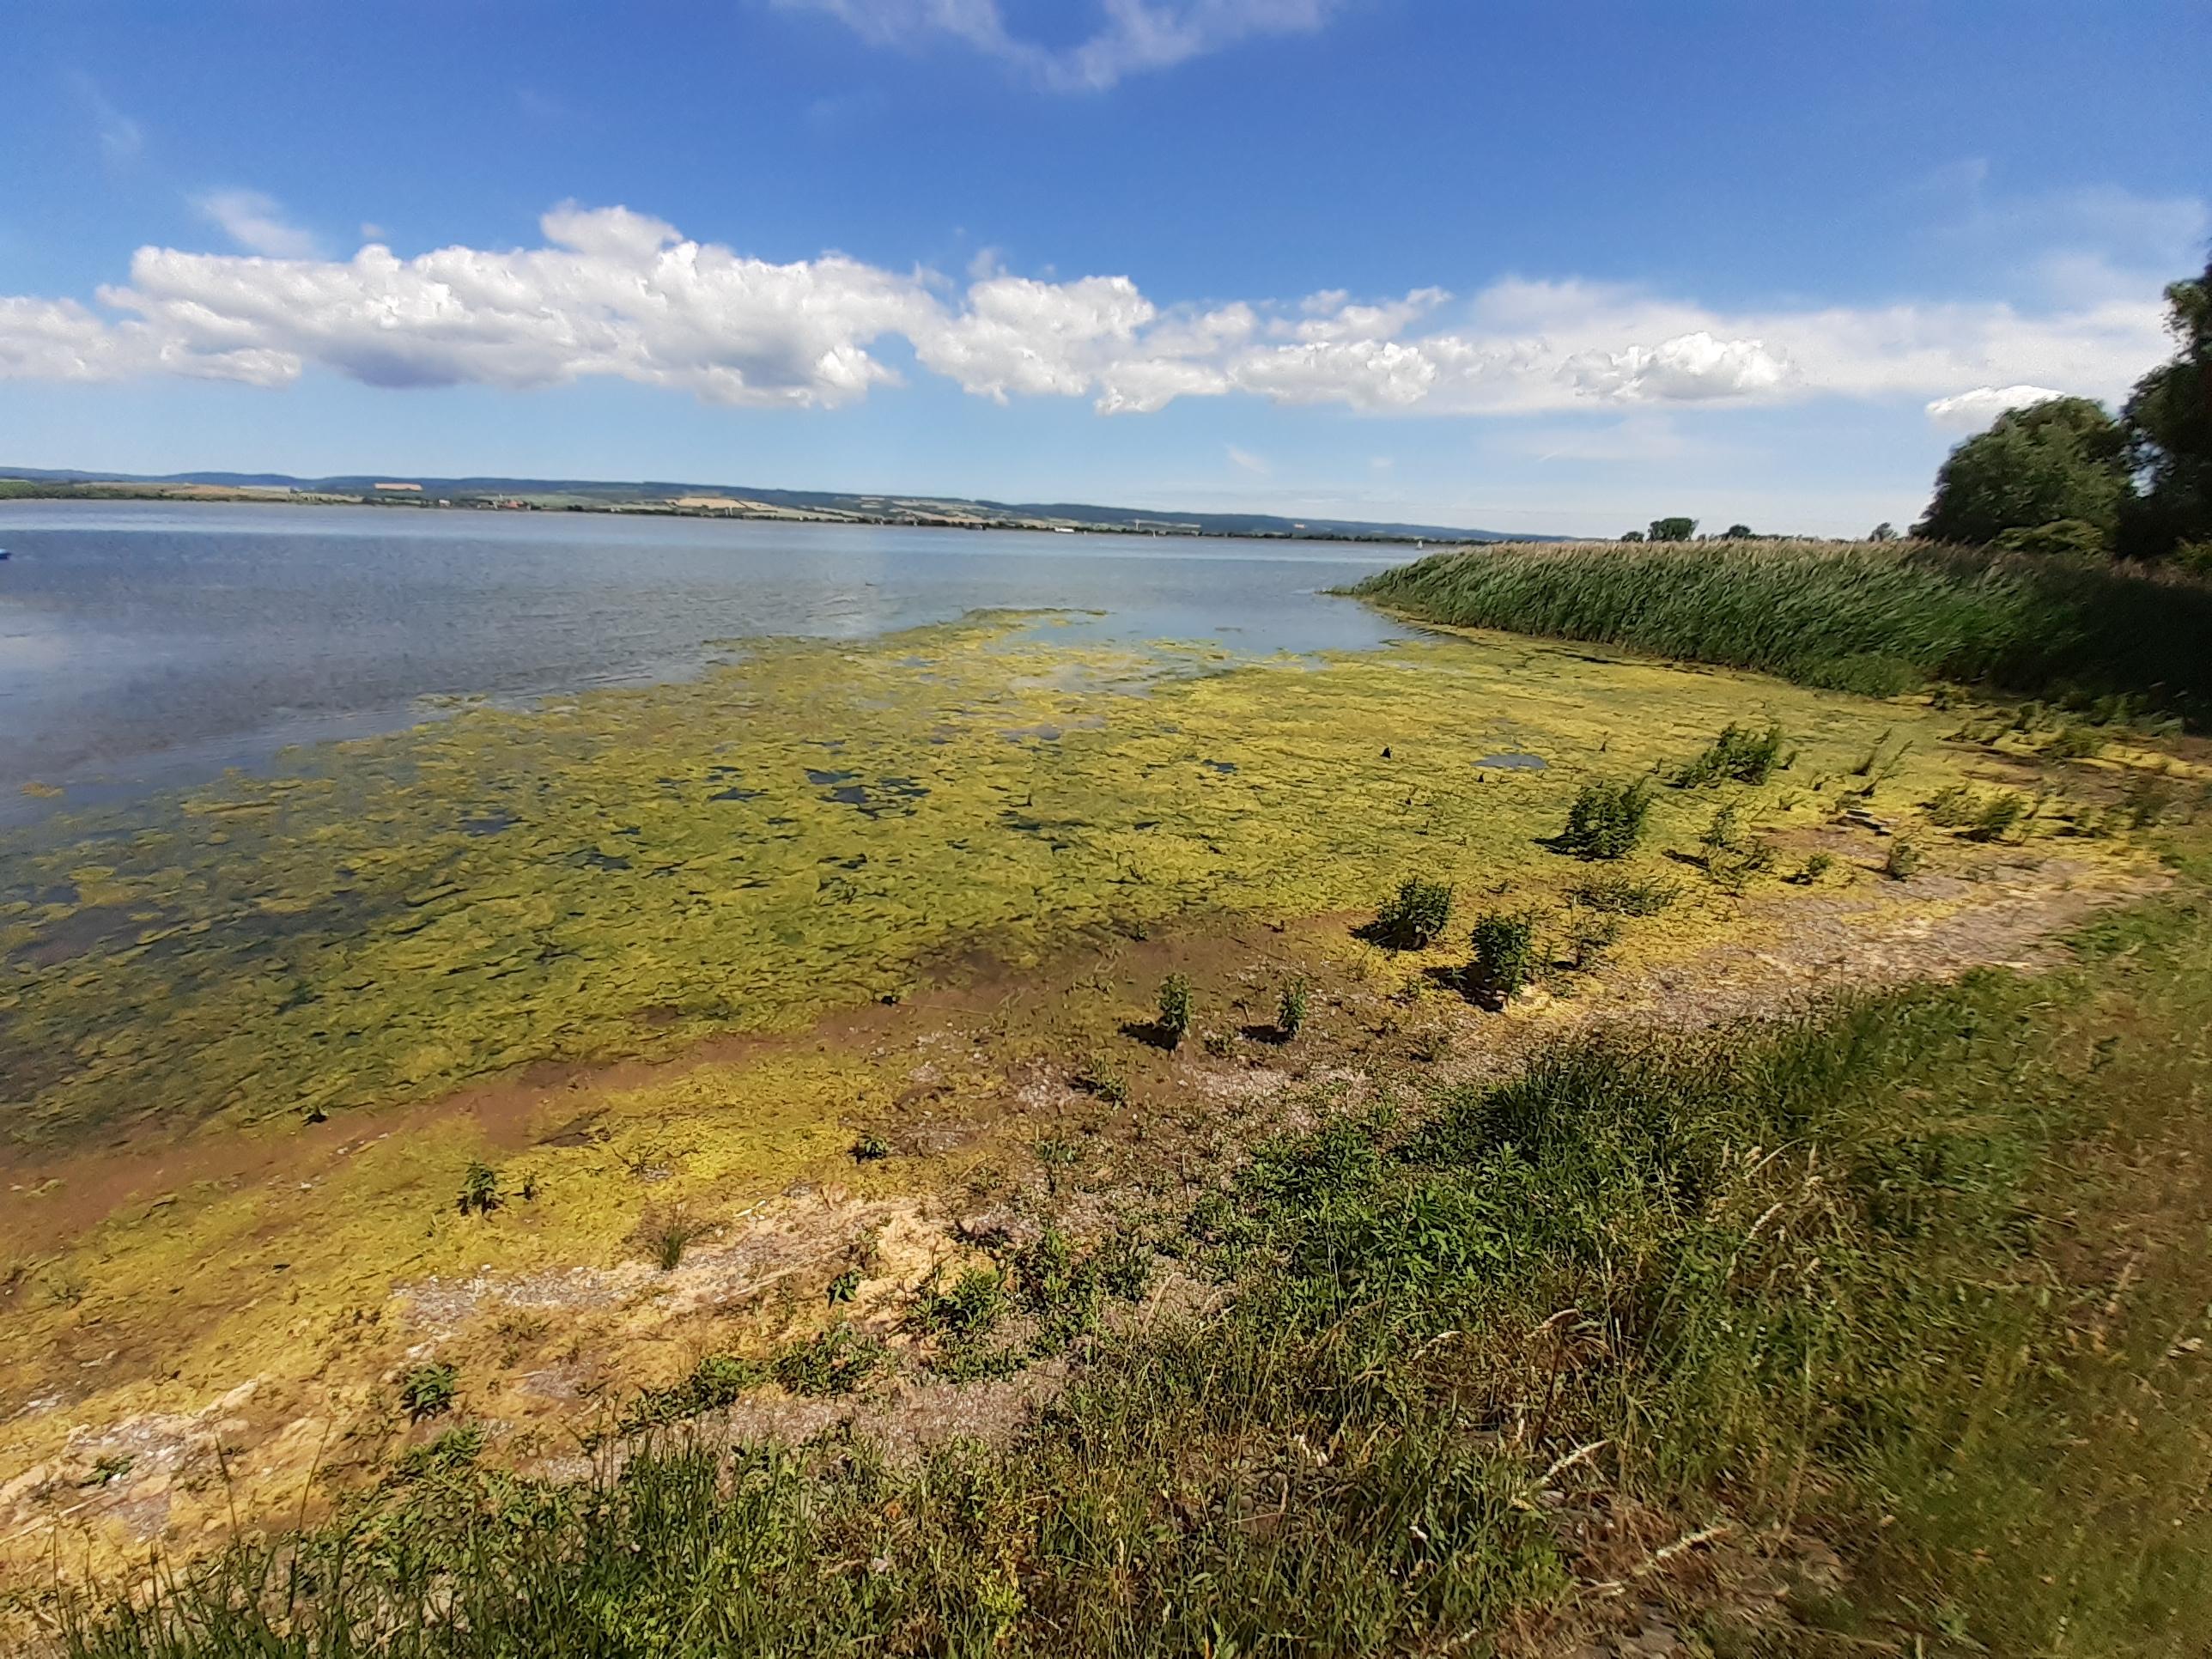 algen Stausee Kelbra.jpg